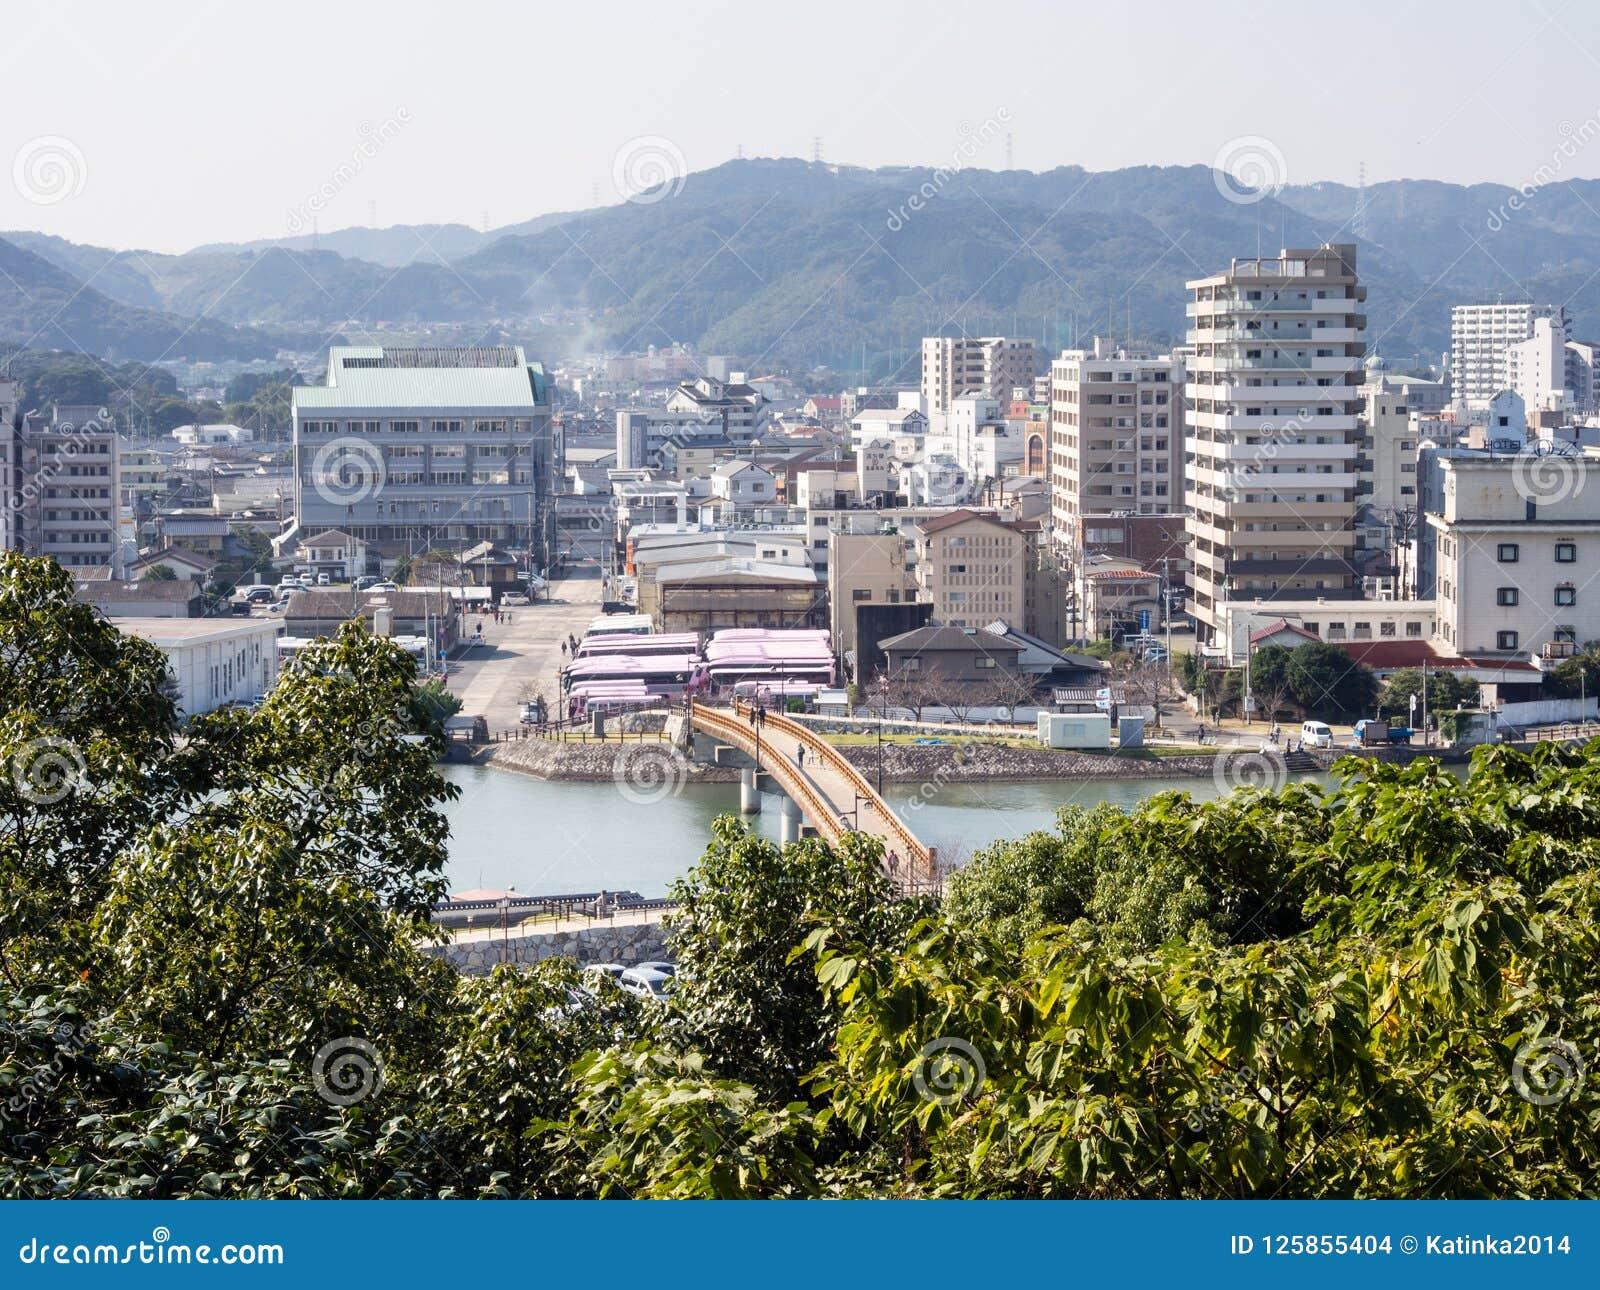 Karatsu city view in the morning